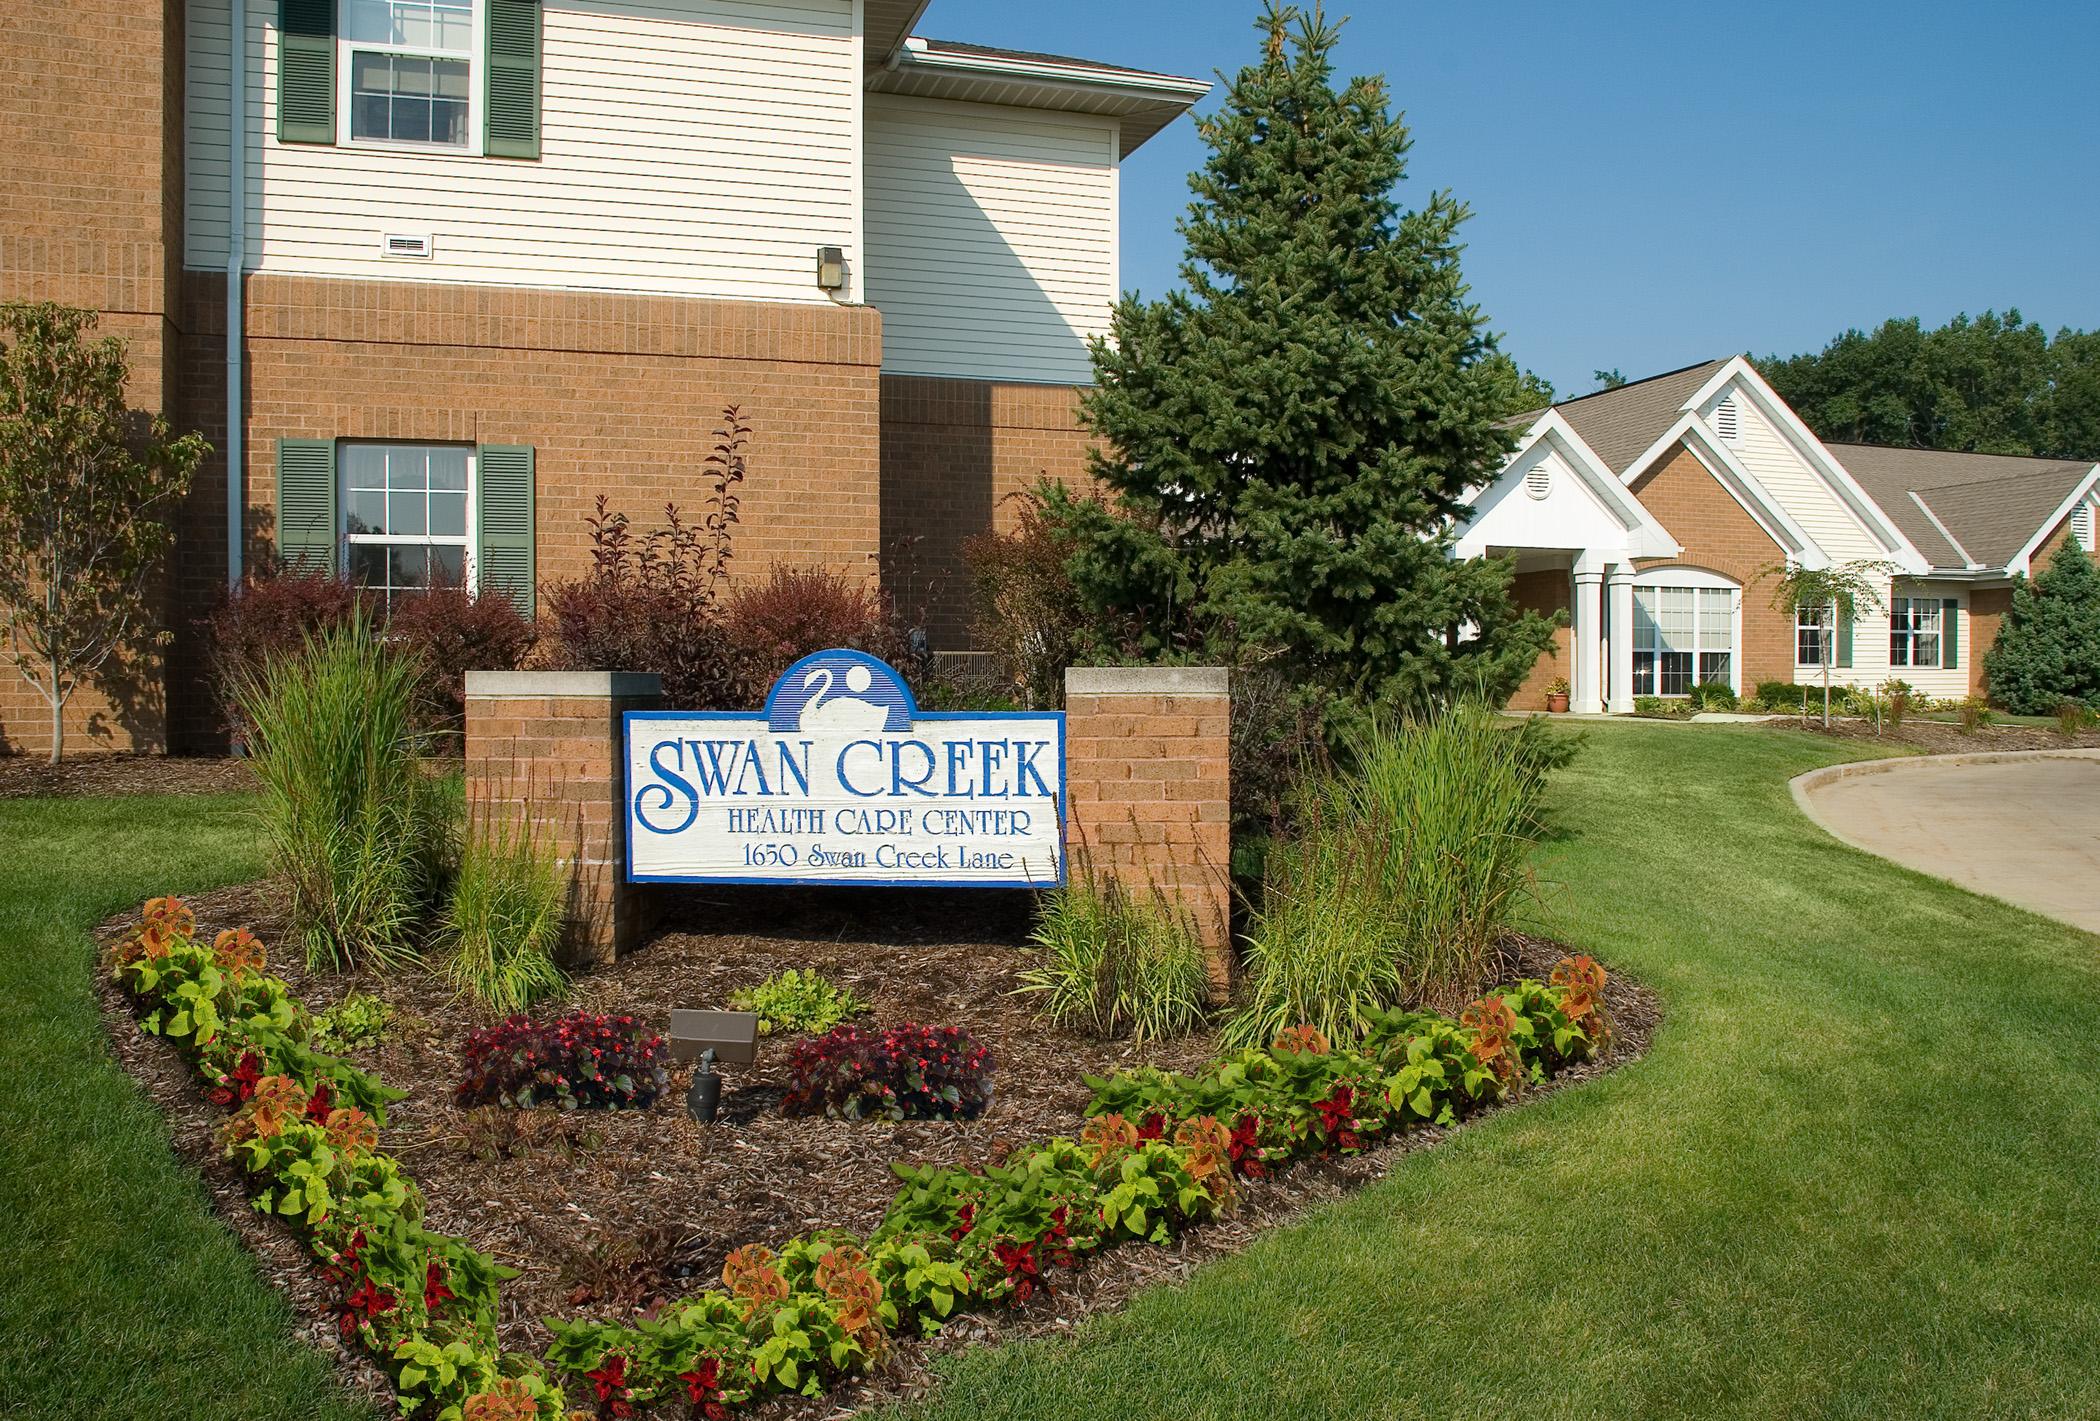 39 U S News 39 Rates Swan Creek Retirement Village In America